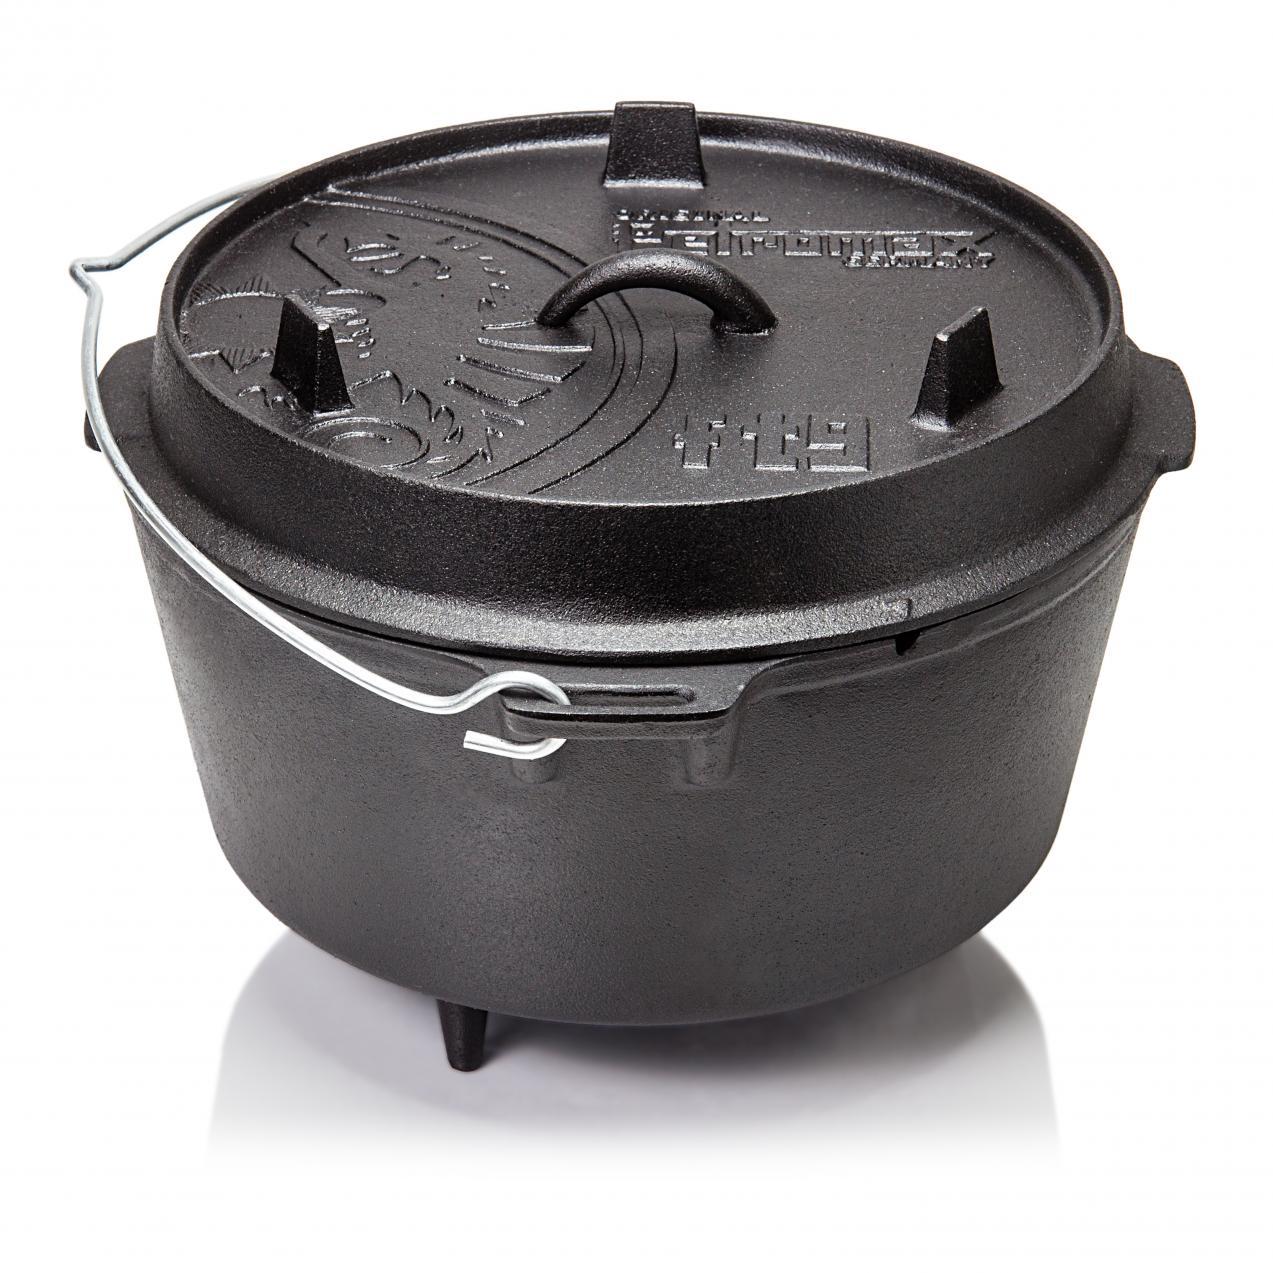 Petromax Dutch Oven ft18